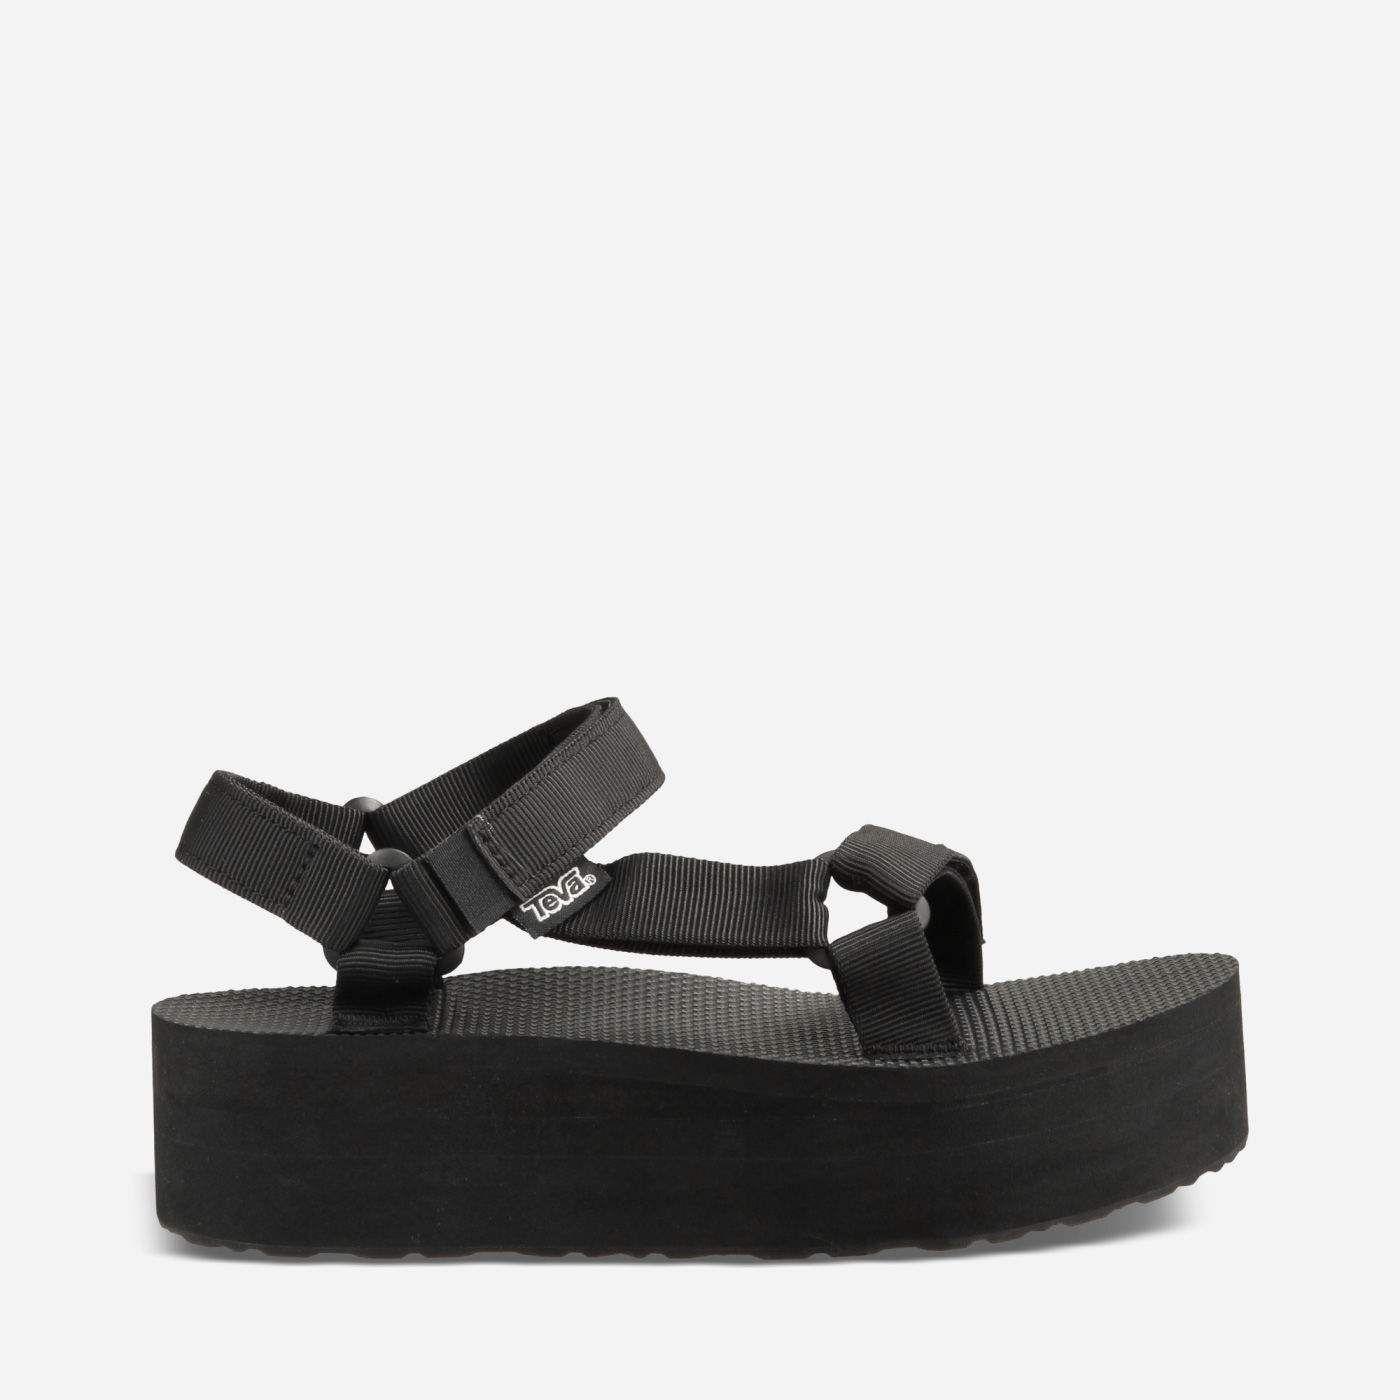 024e2f77326 Flatform Universal   ♡ s h o e s ♡   Teva flatform, Sandals, Socks ...